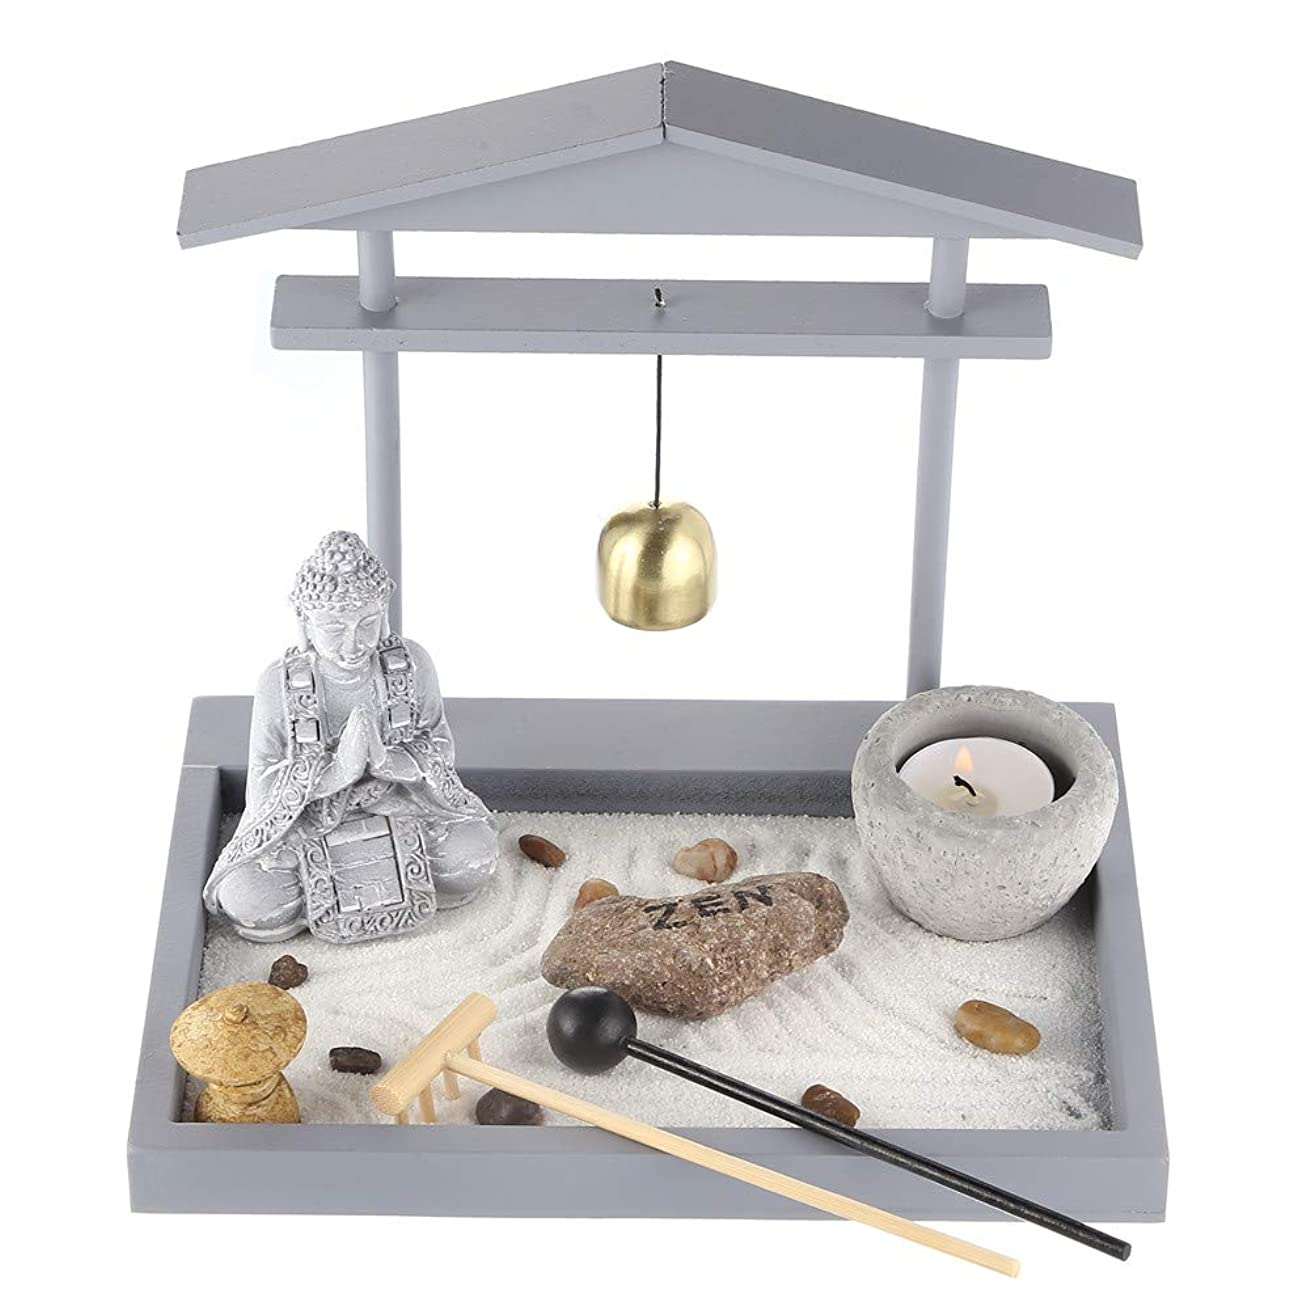 Prime Feng Shui Zen Garden Buddha Figures Mini Bell Archway Garden Kit with Sand Rocks Rake Tower Candle Holder Best Gift(Grey)